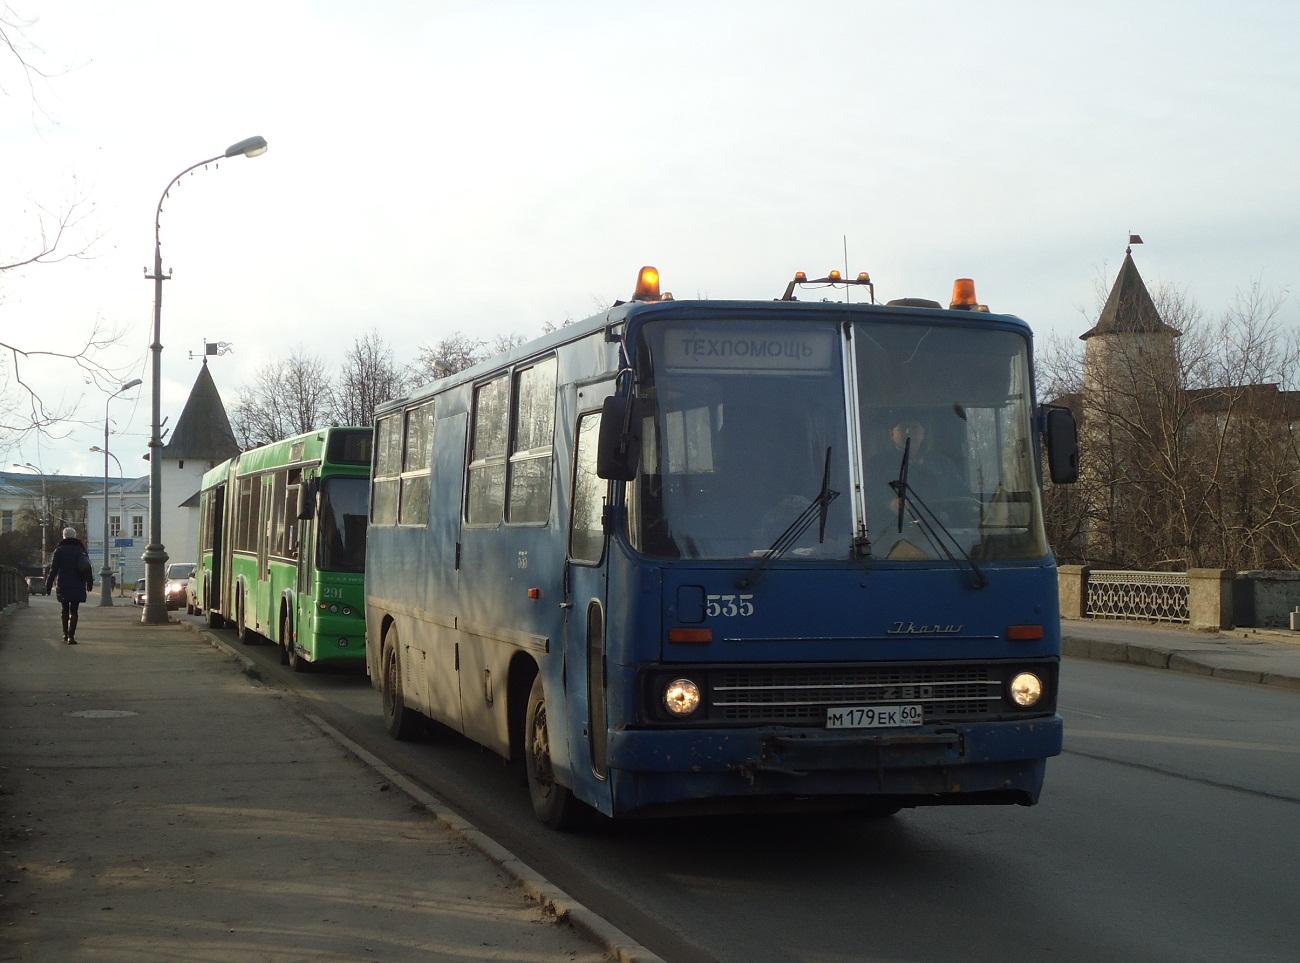 Техпомощь на шасси Ikarus 280.33 #М 179 ЕК 60. Псков, улица Леона Поземского